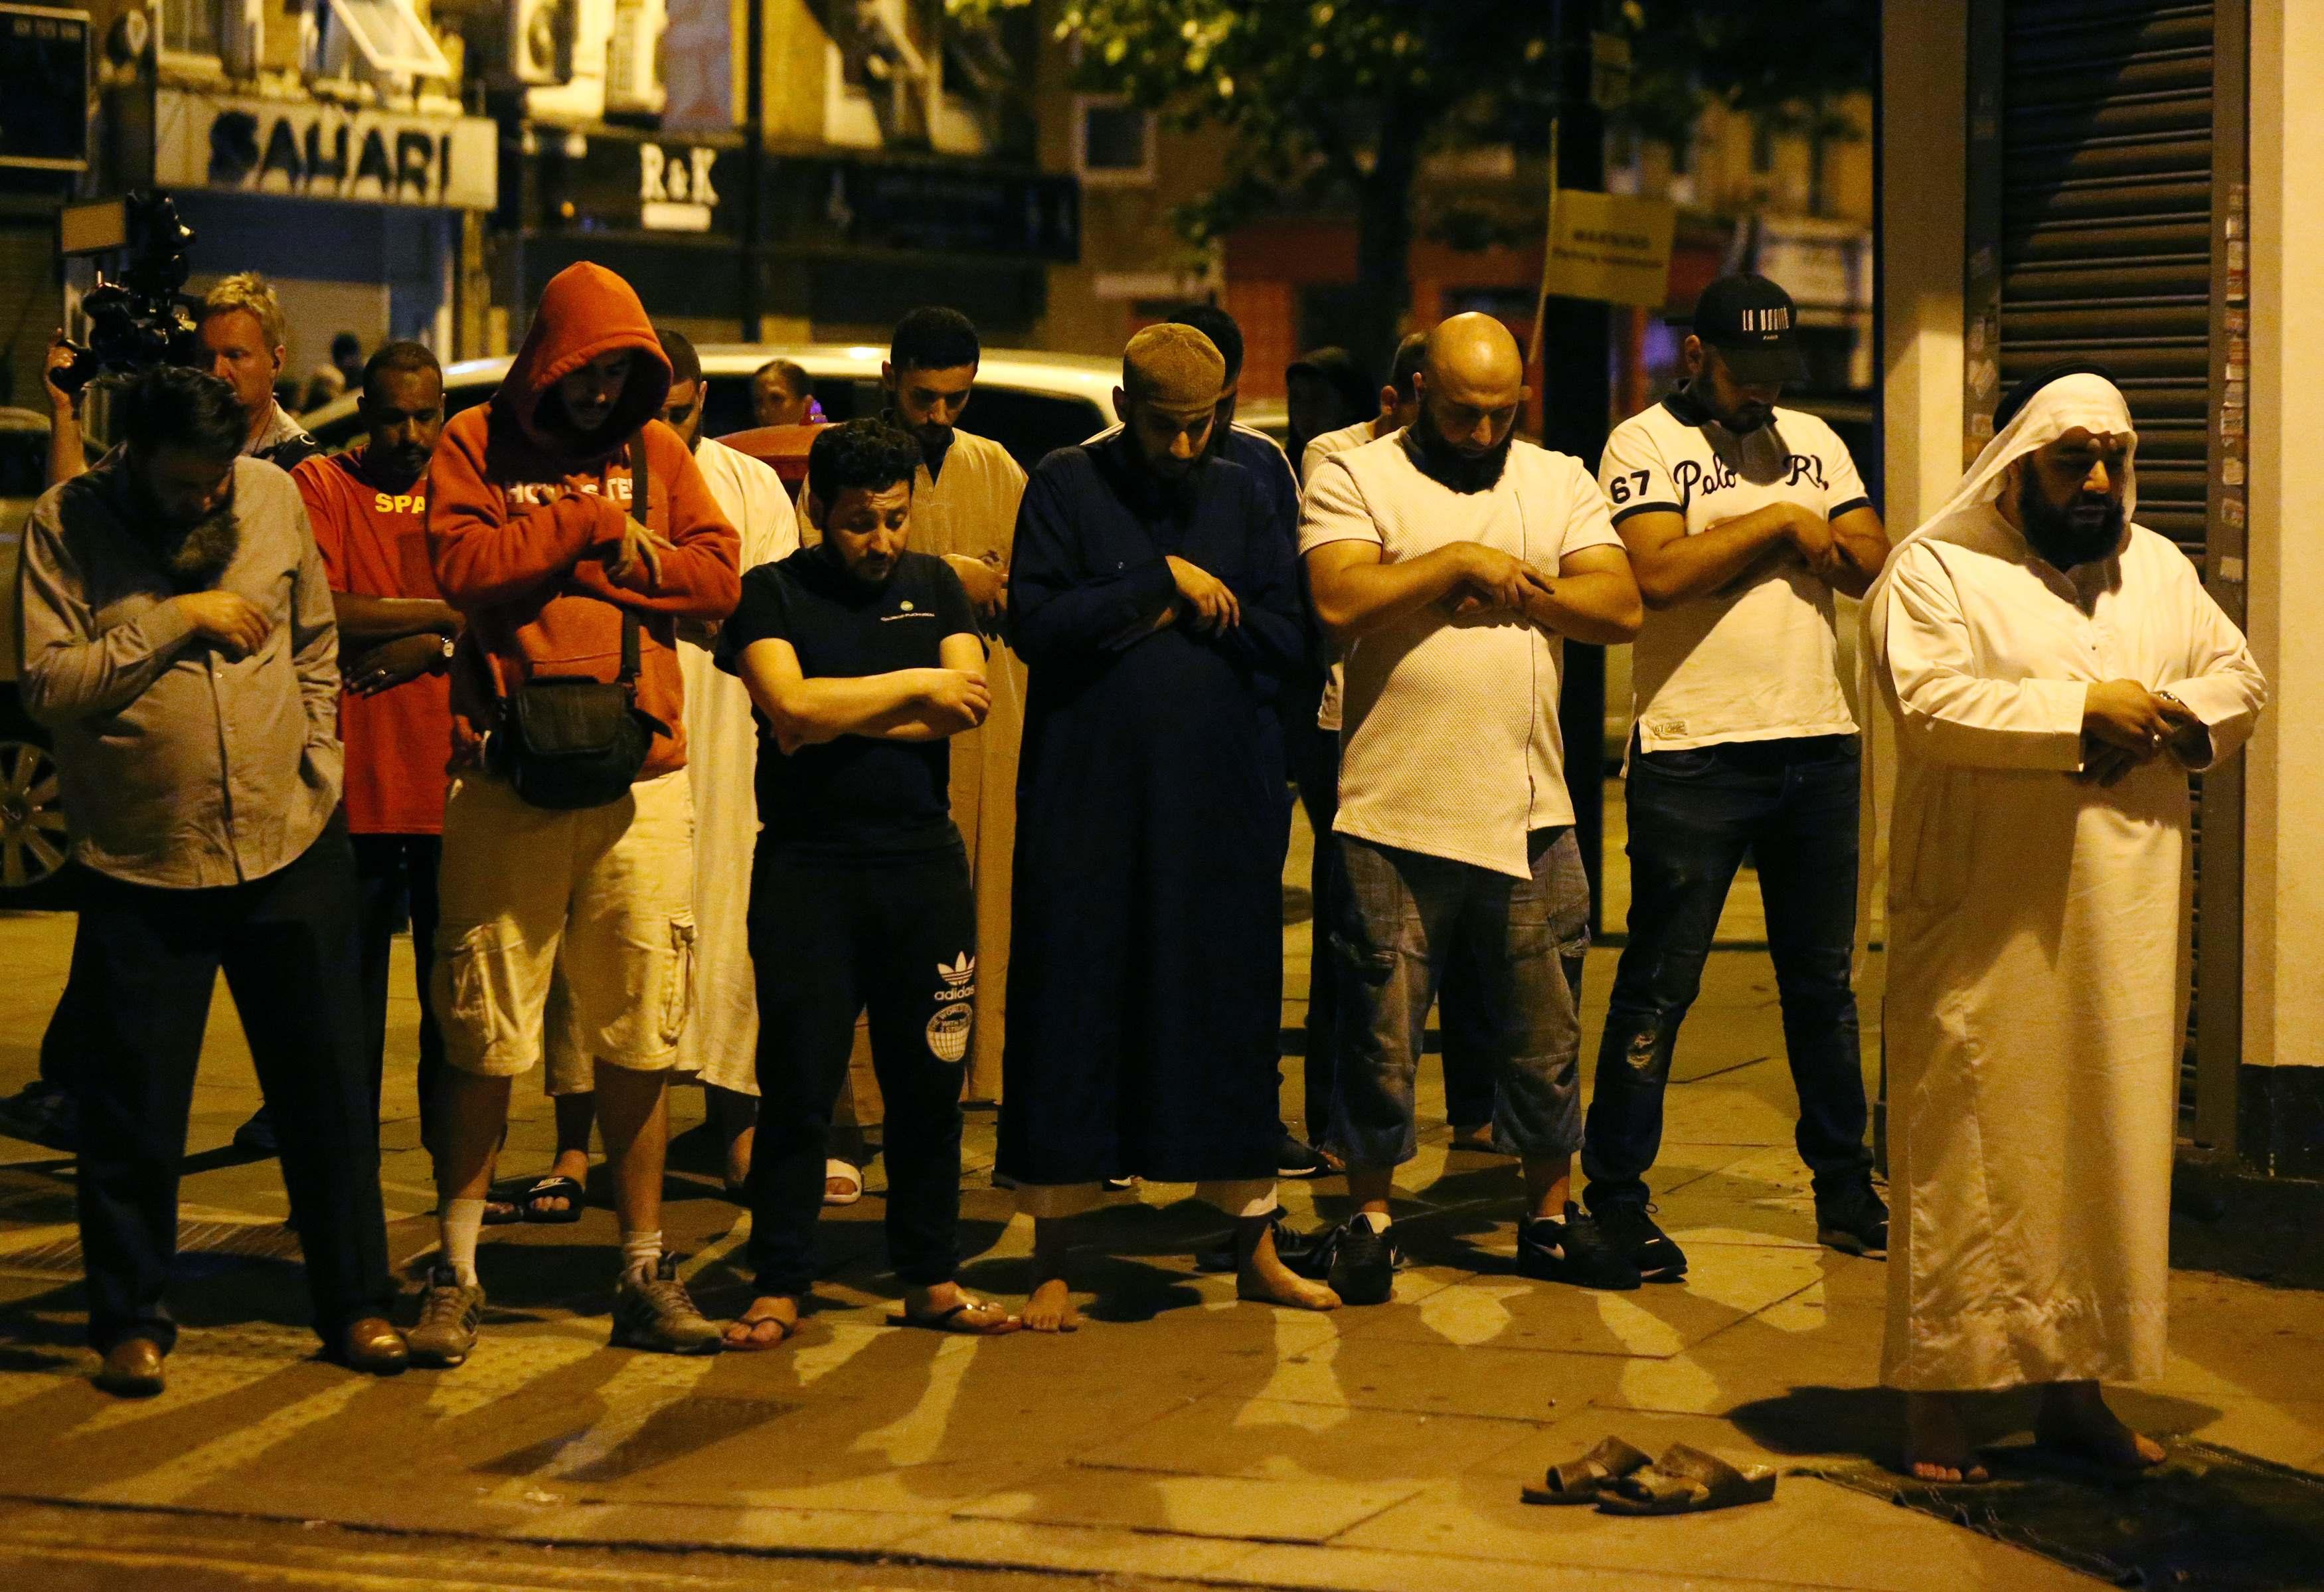 Fieles rezan tras el ataque frente a la mezquita, al norte de Londres (Reuters)